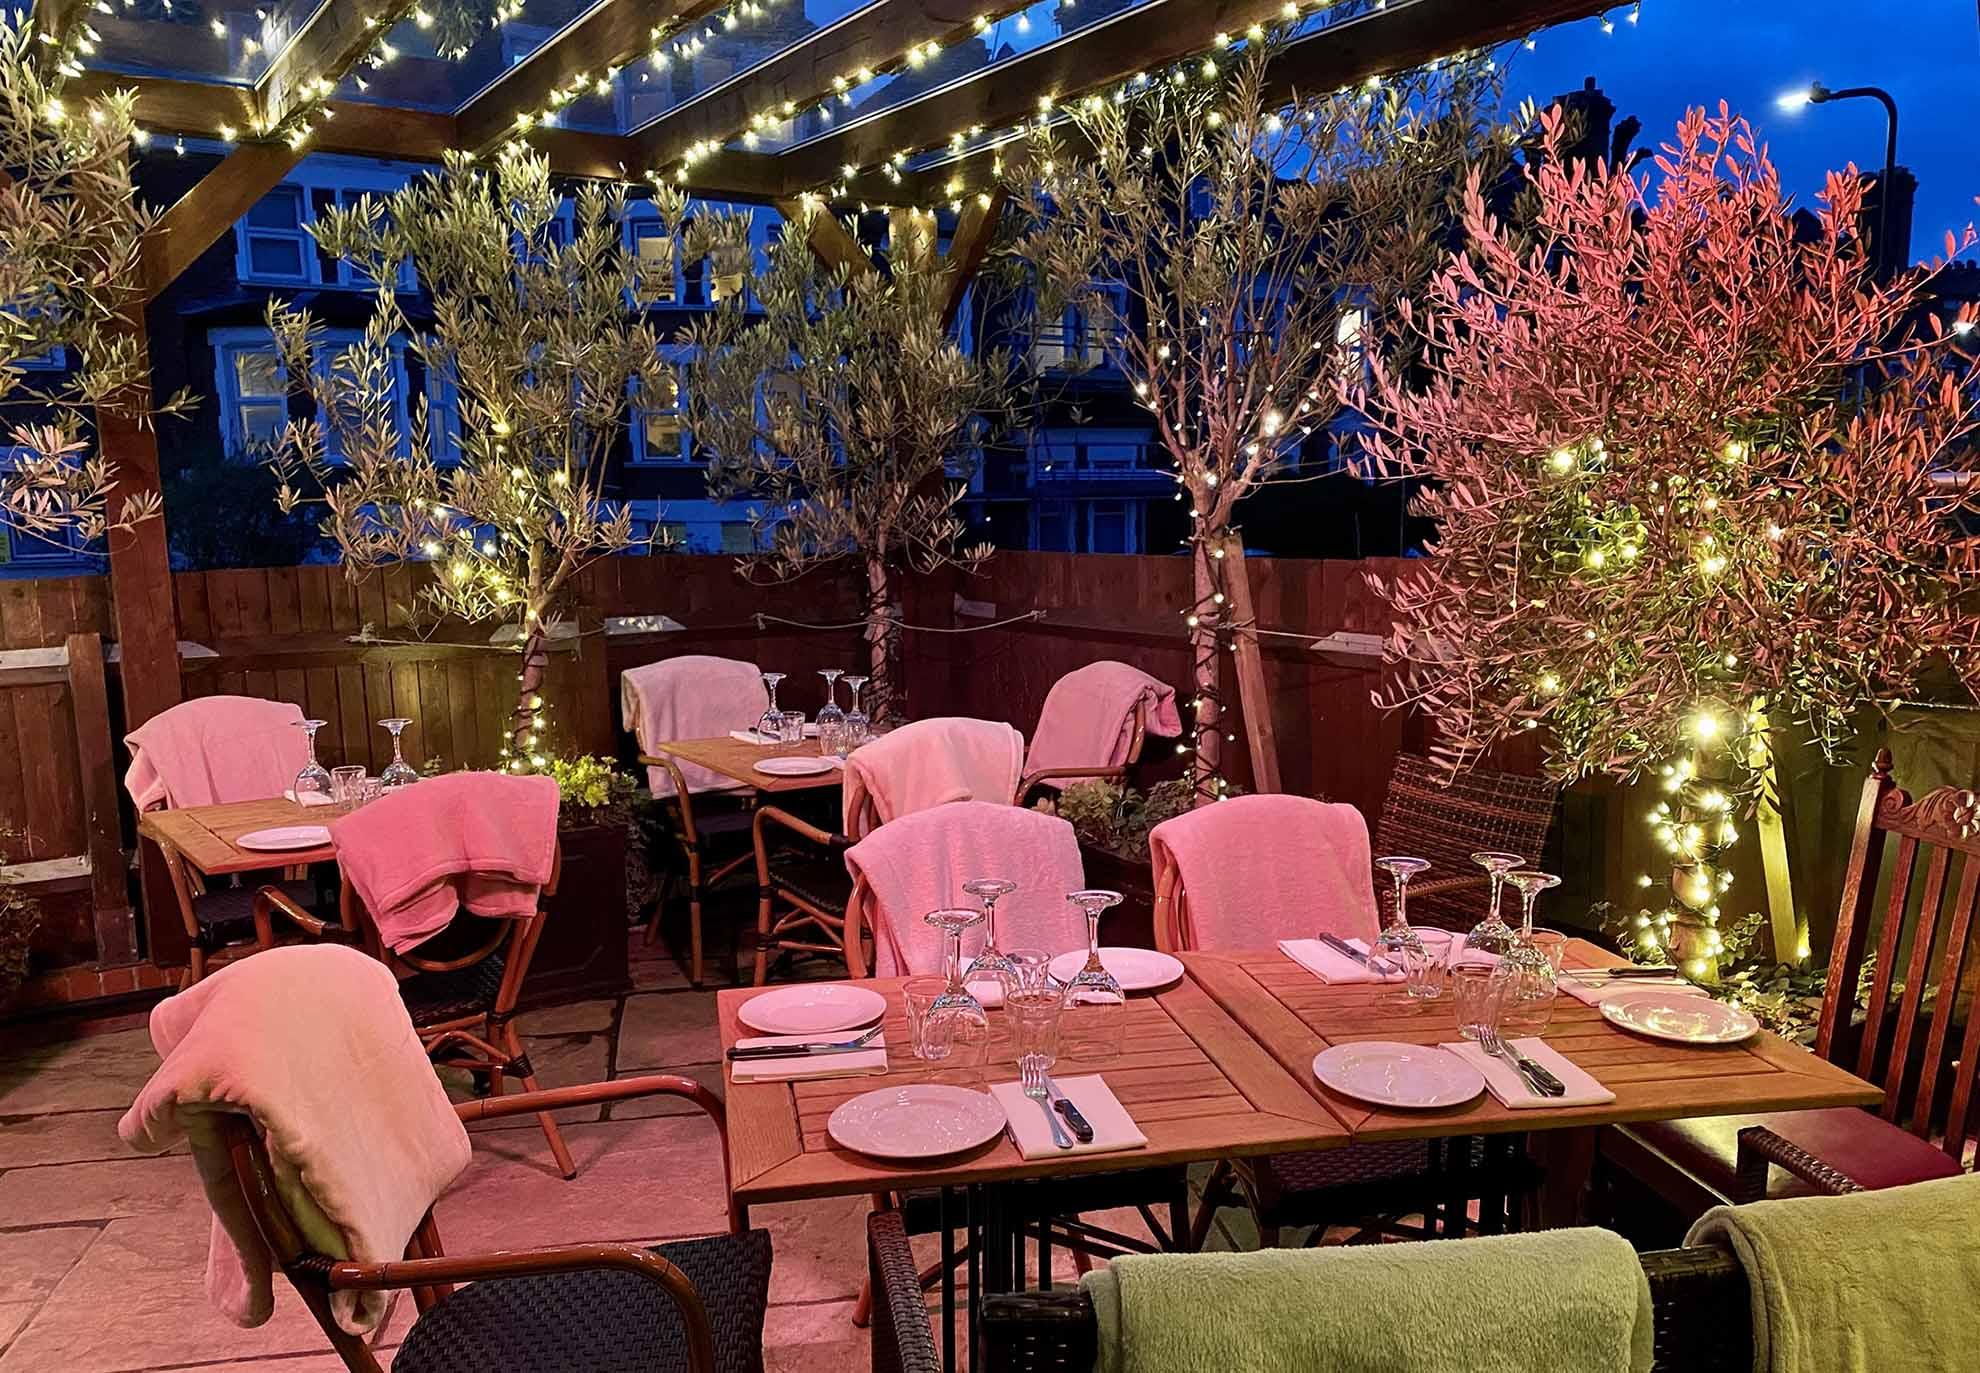 Sanzio-Restaurant-Outdoor-Dining